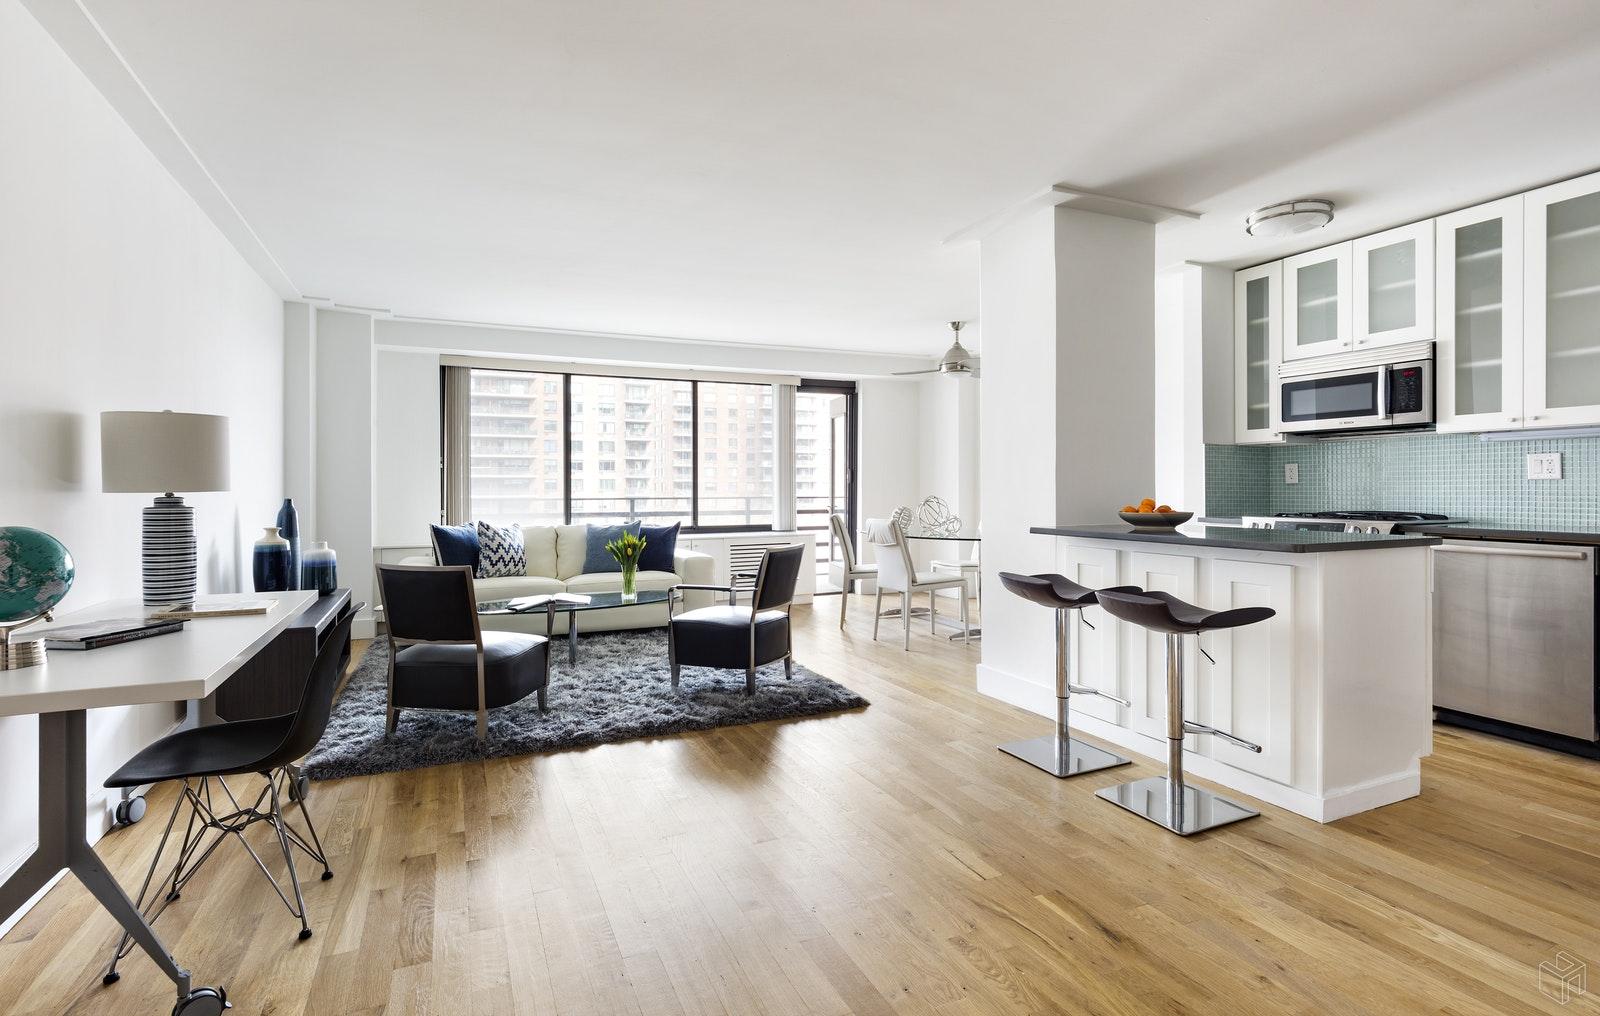 382 CENTRAL PARK WEST 8A, Upper West Side, $1,199,000, Web #: 19482481